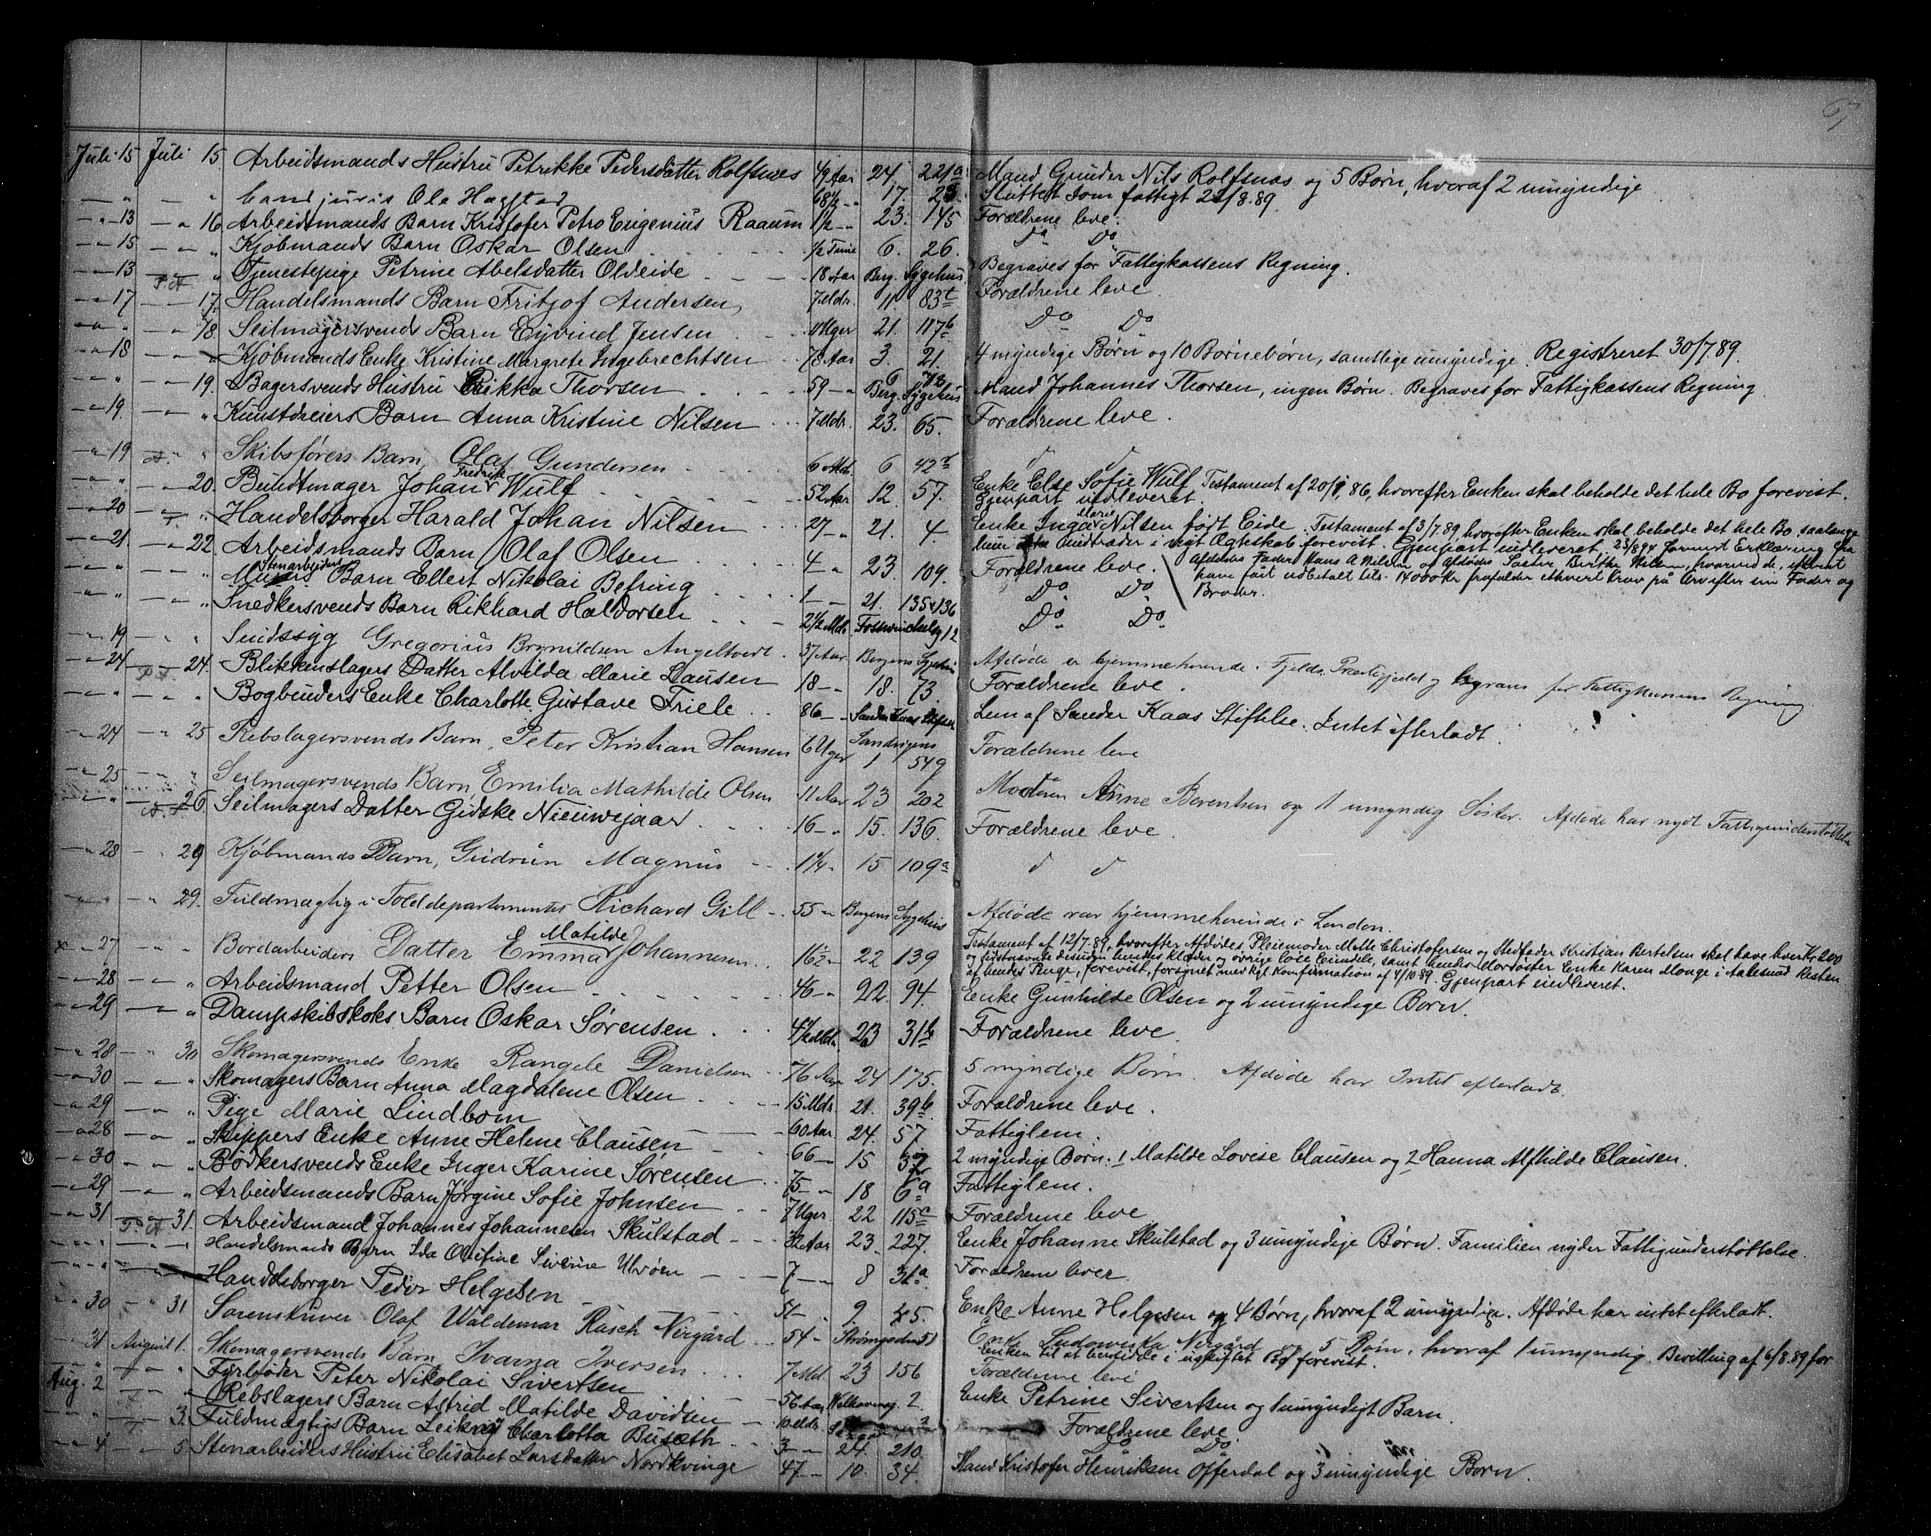 SAB, Byfogd og Byskriver i Bergen, 06/06Na/L0005: Dødsfallsjournaler, 1886-1892, s. 66b-67a